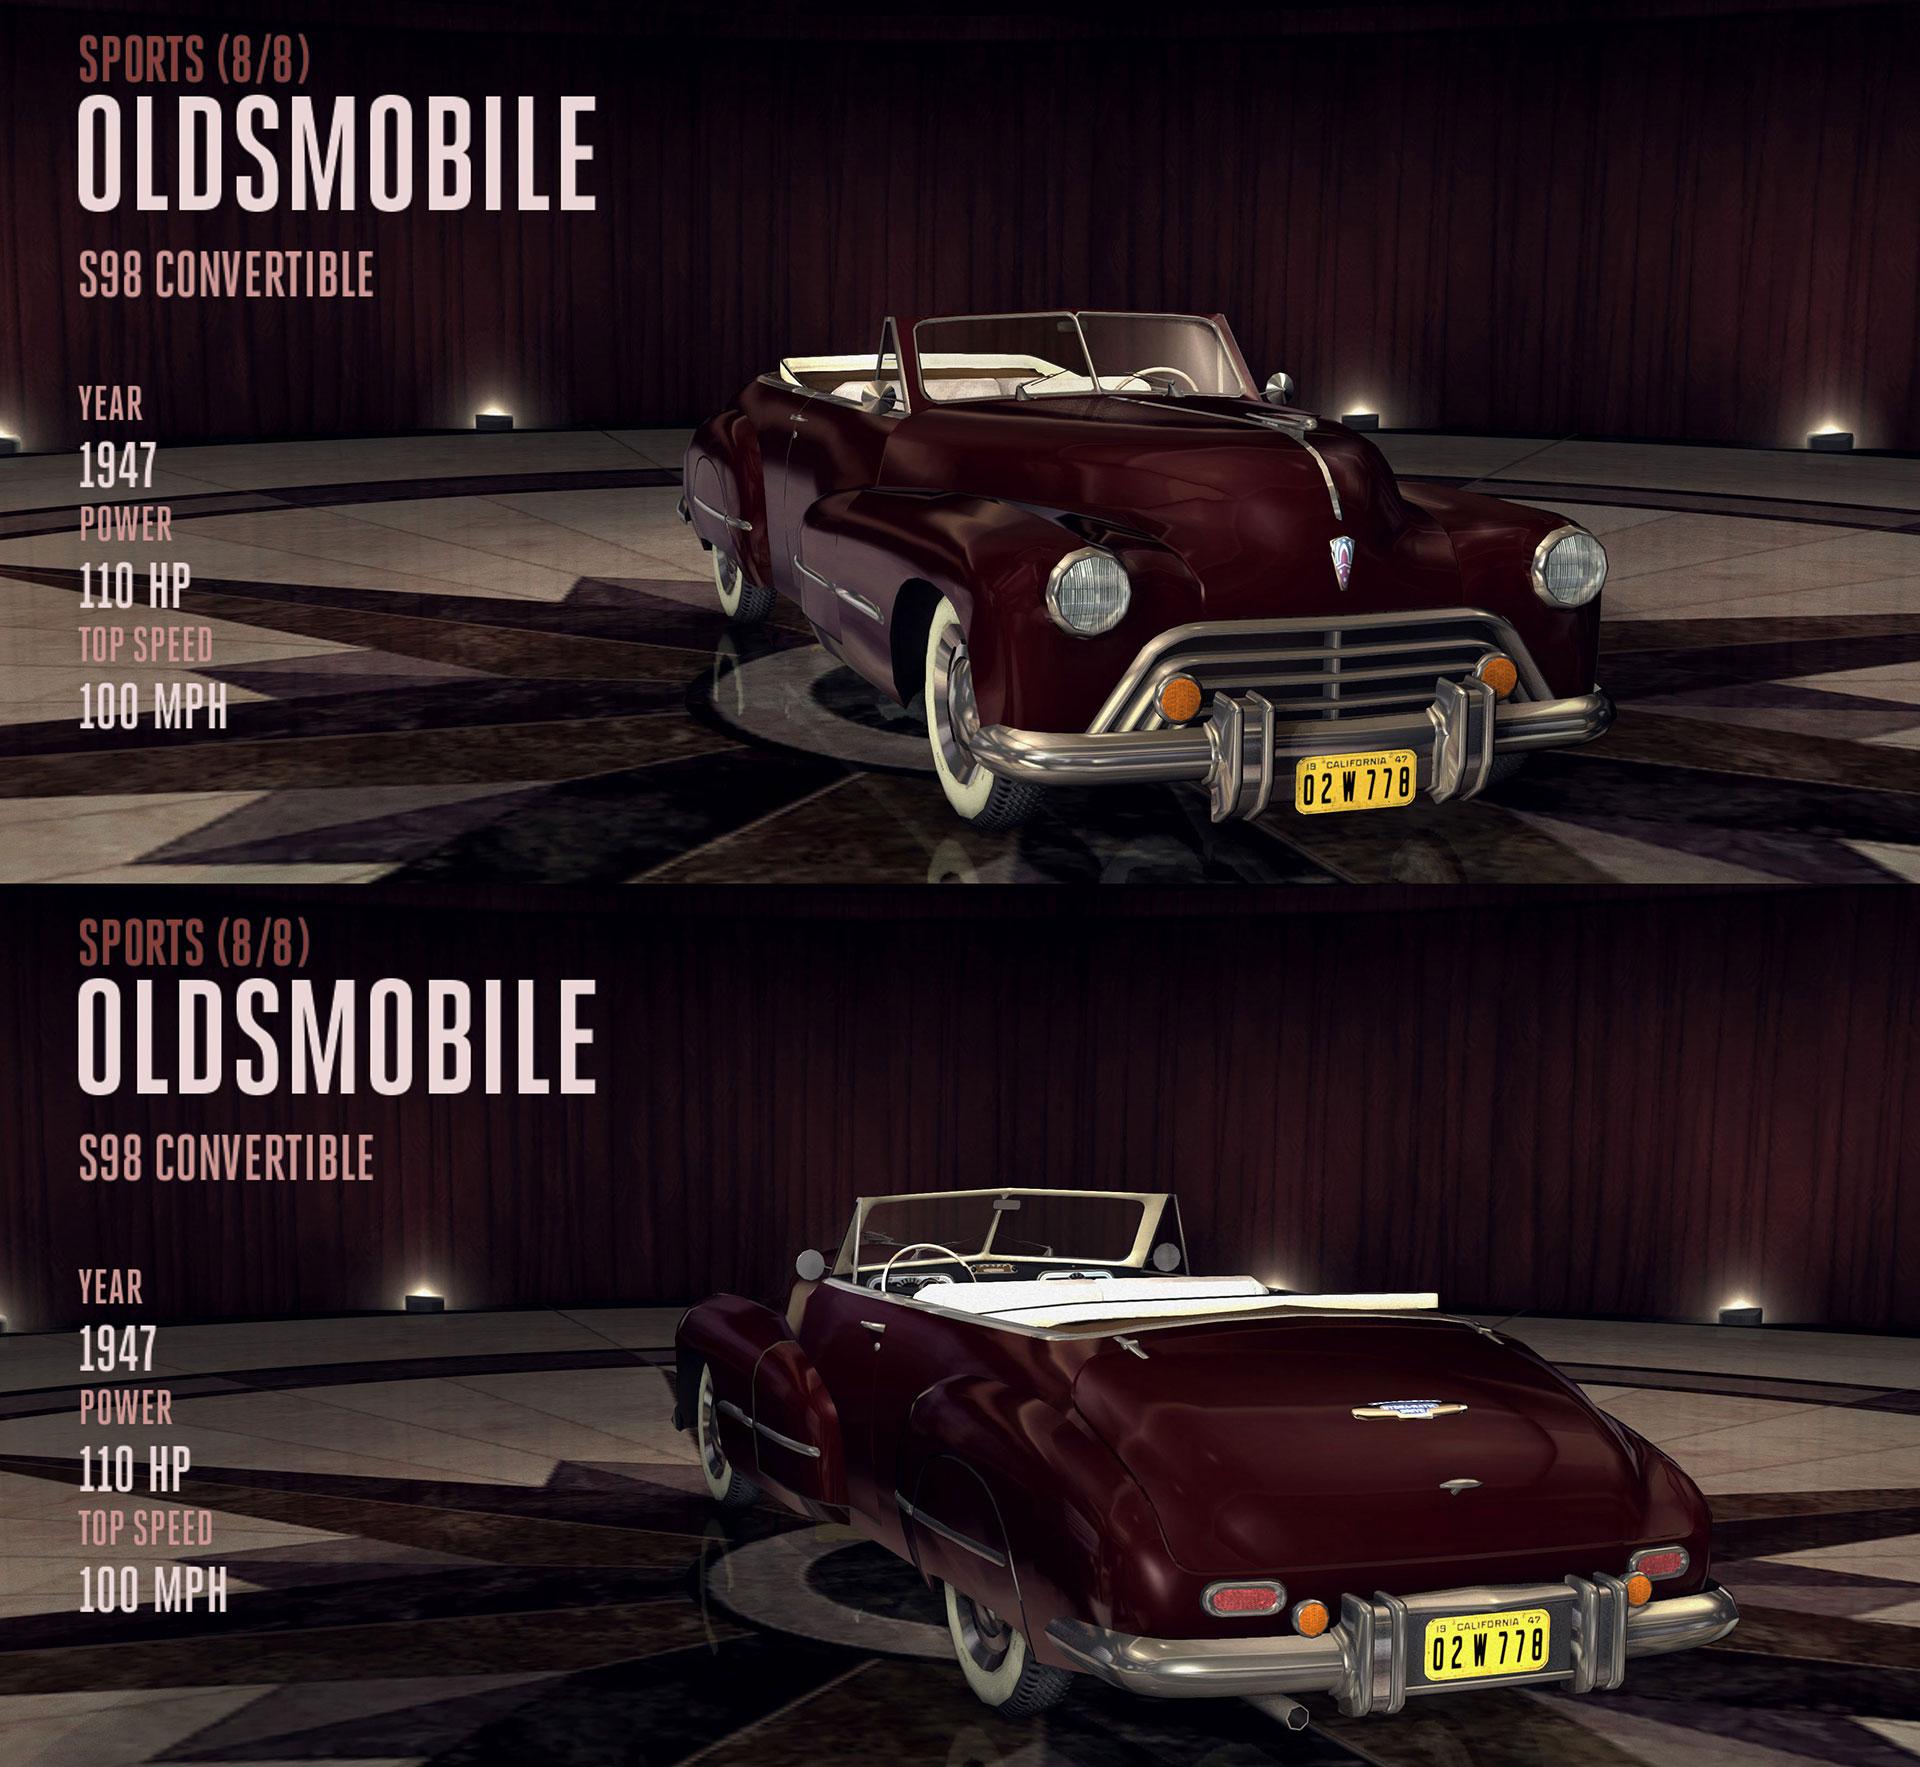 Archivo:1947-oldsmobile-s98-convertible.jpg